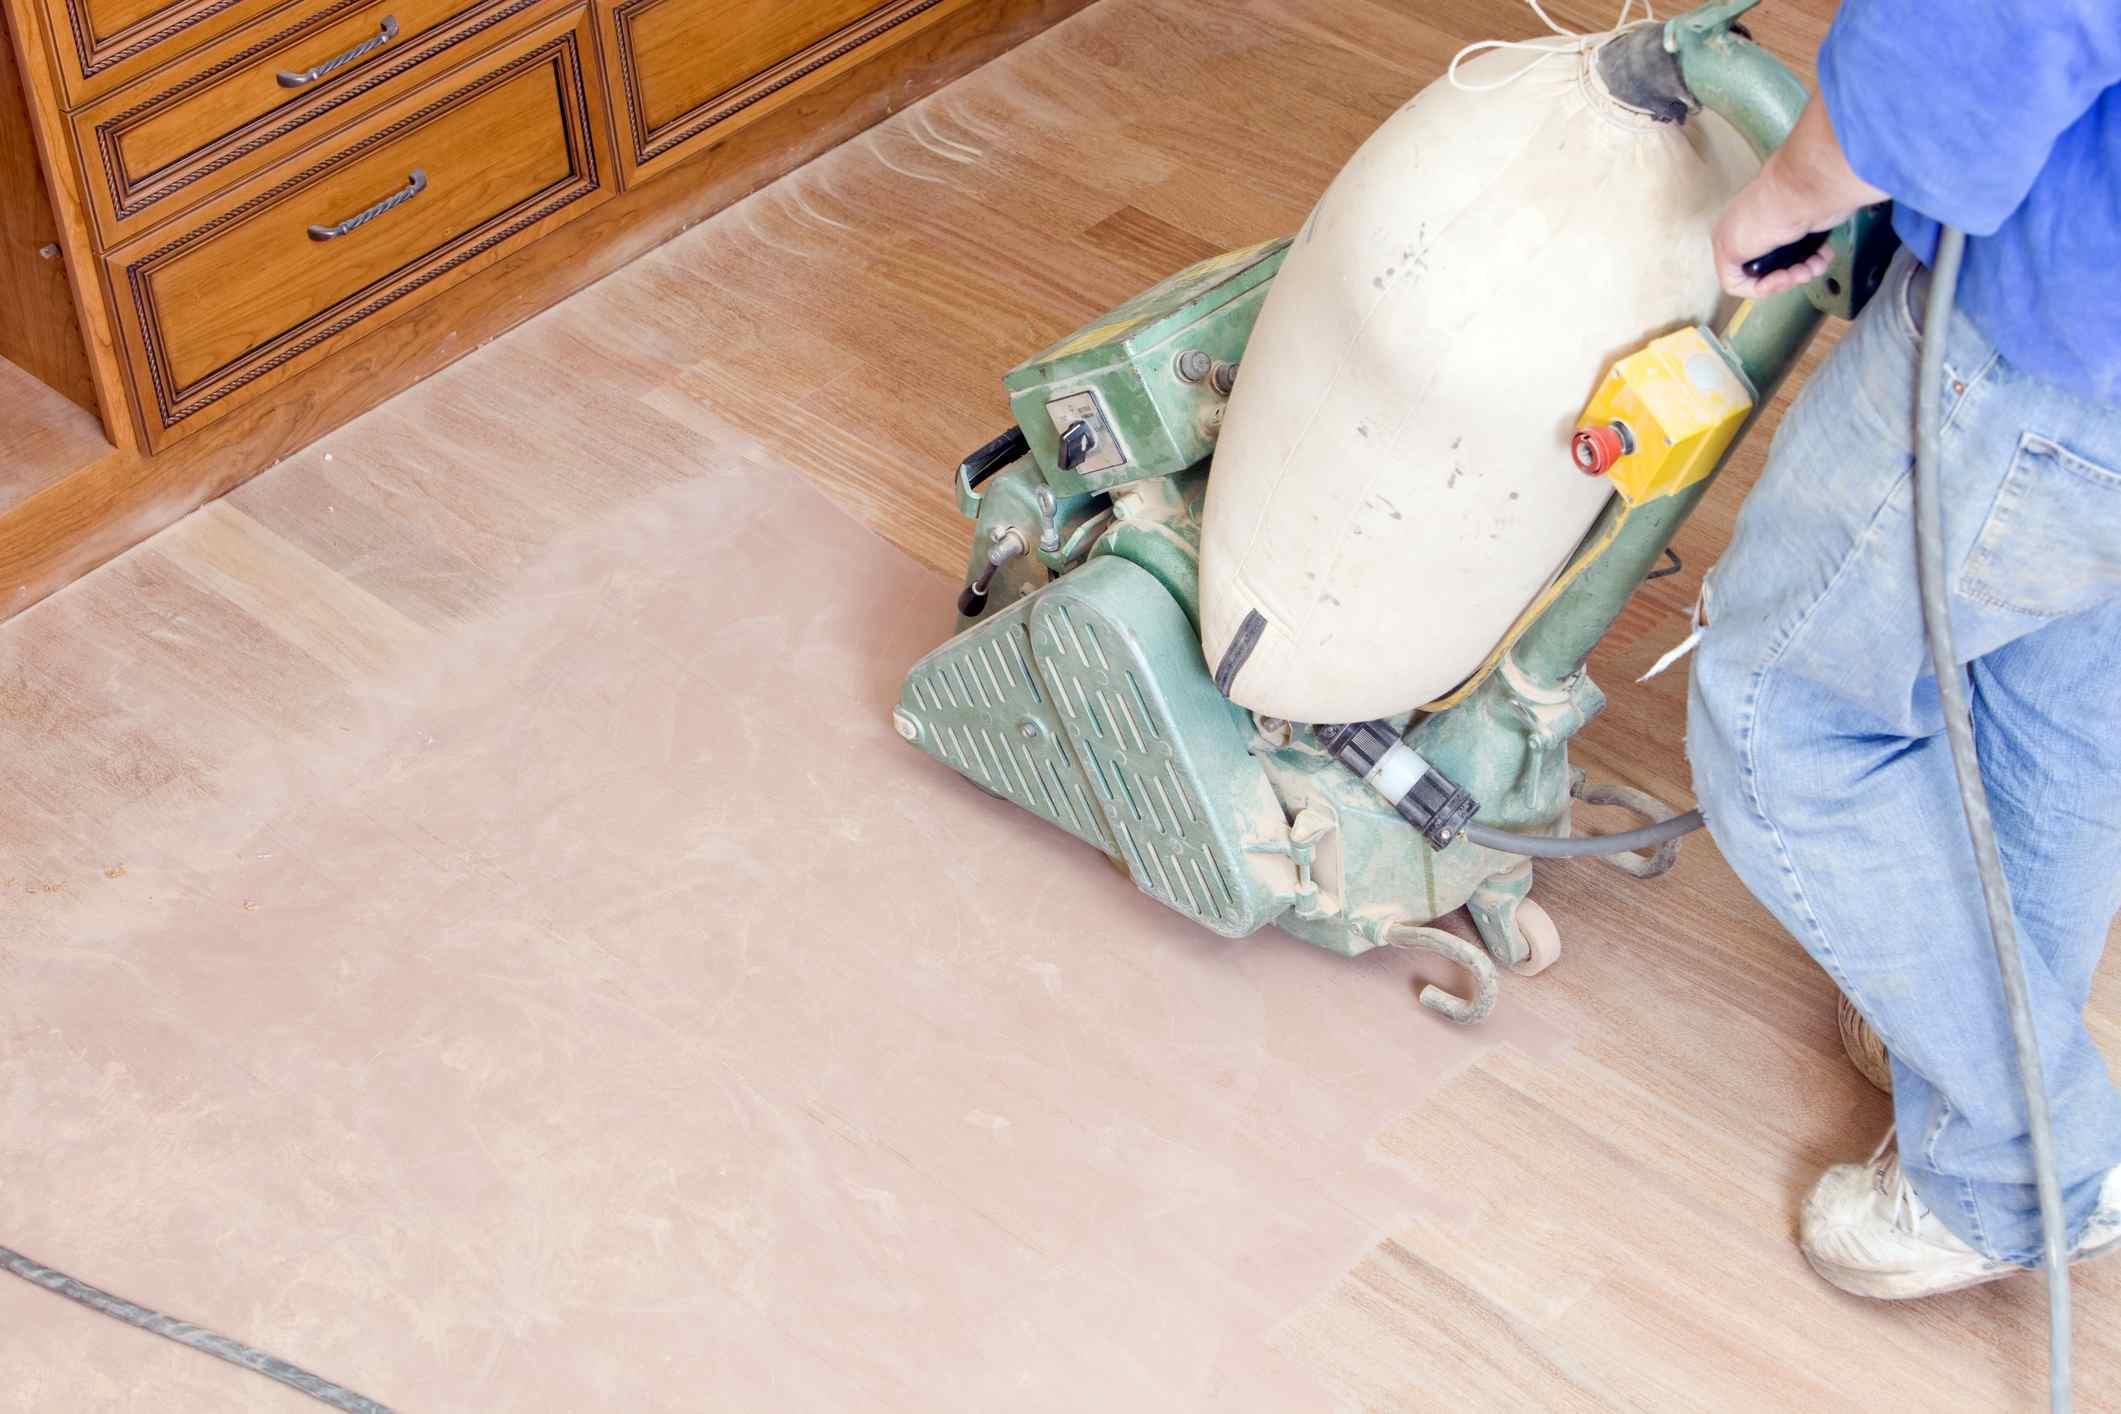 drum sander to sand wood floors